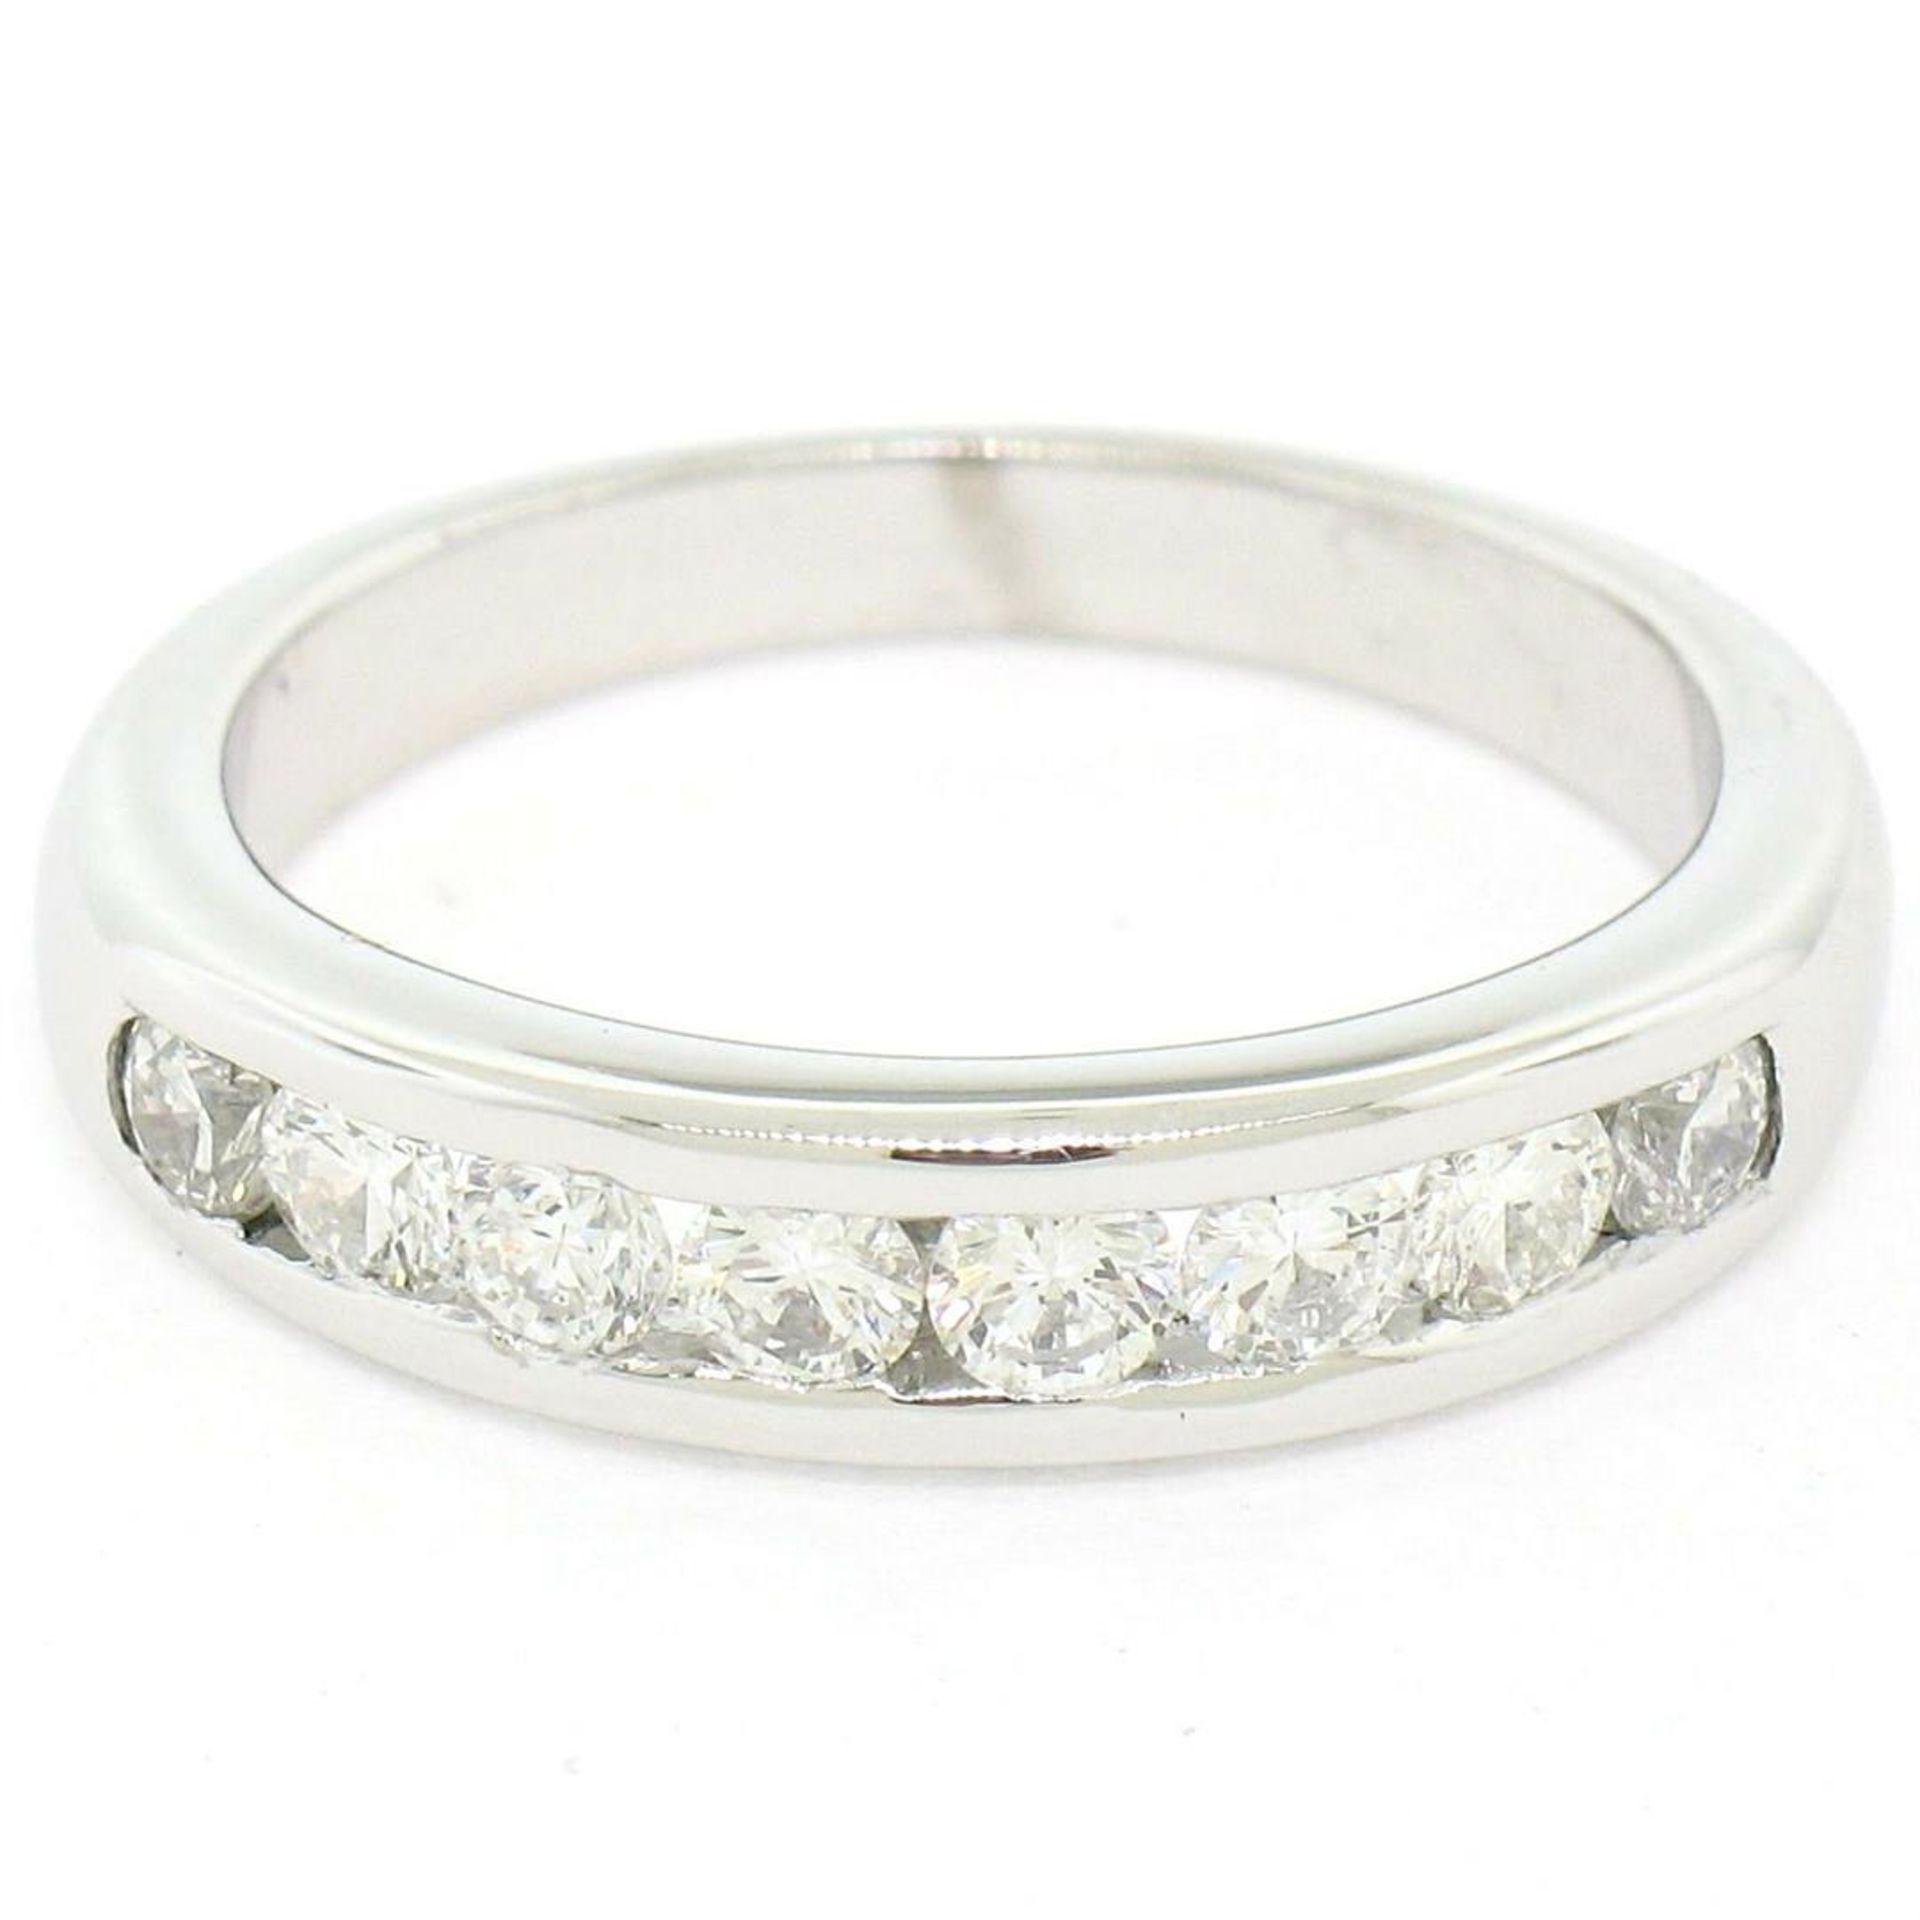 Classic Platinum .80ctw Channel Set Round Brilliant VS Diamond Wedding Band Ring - Image 2 of 8